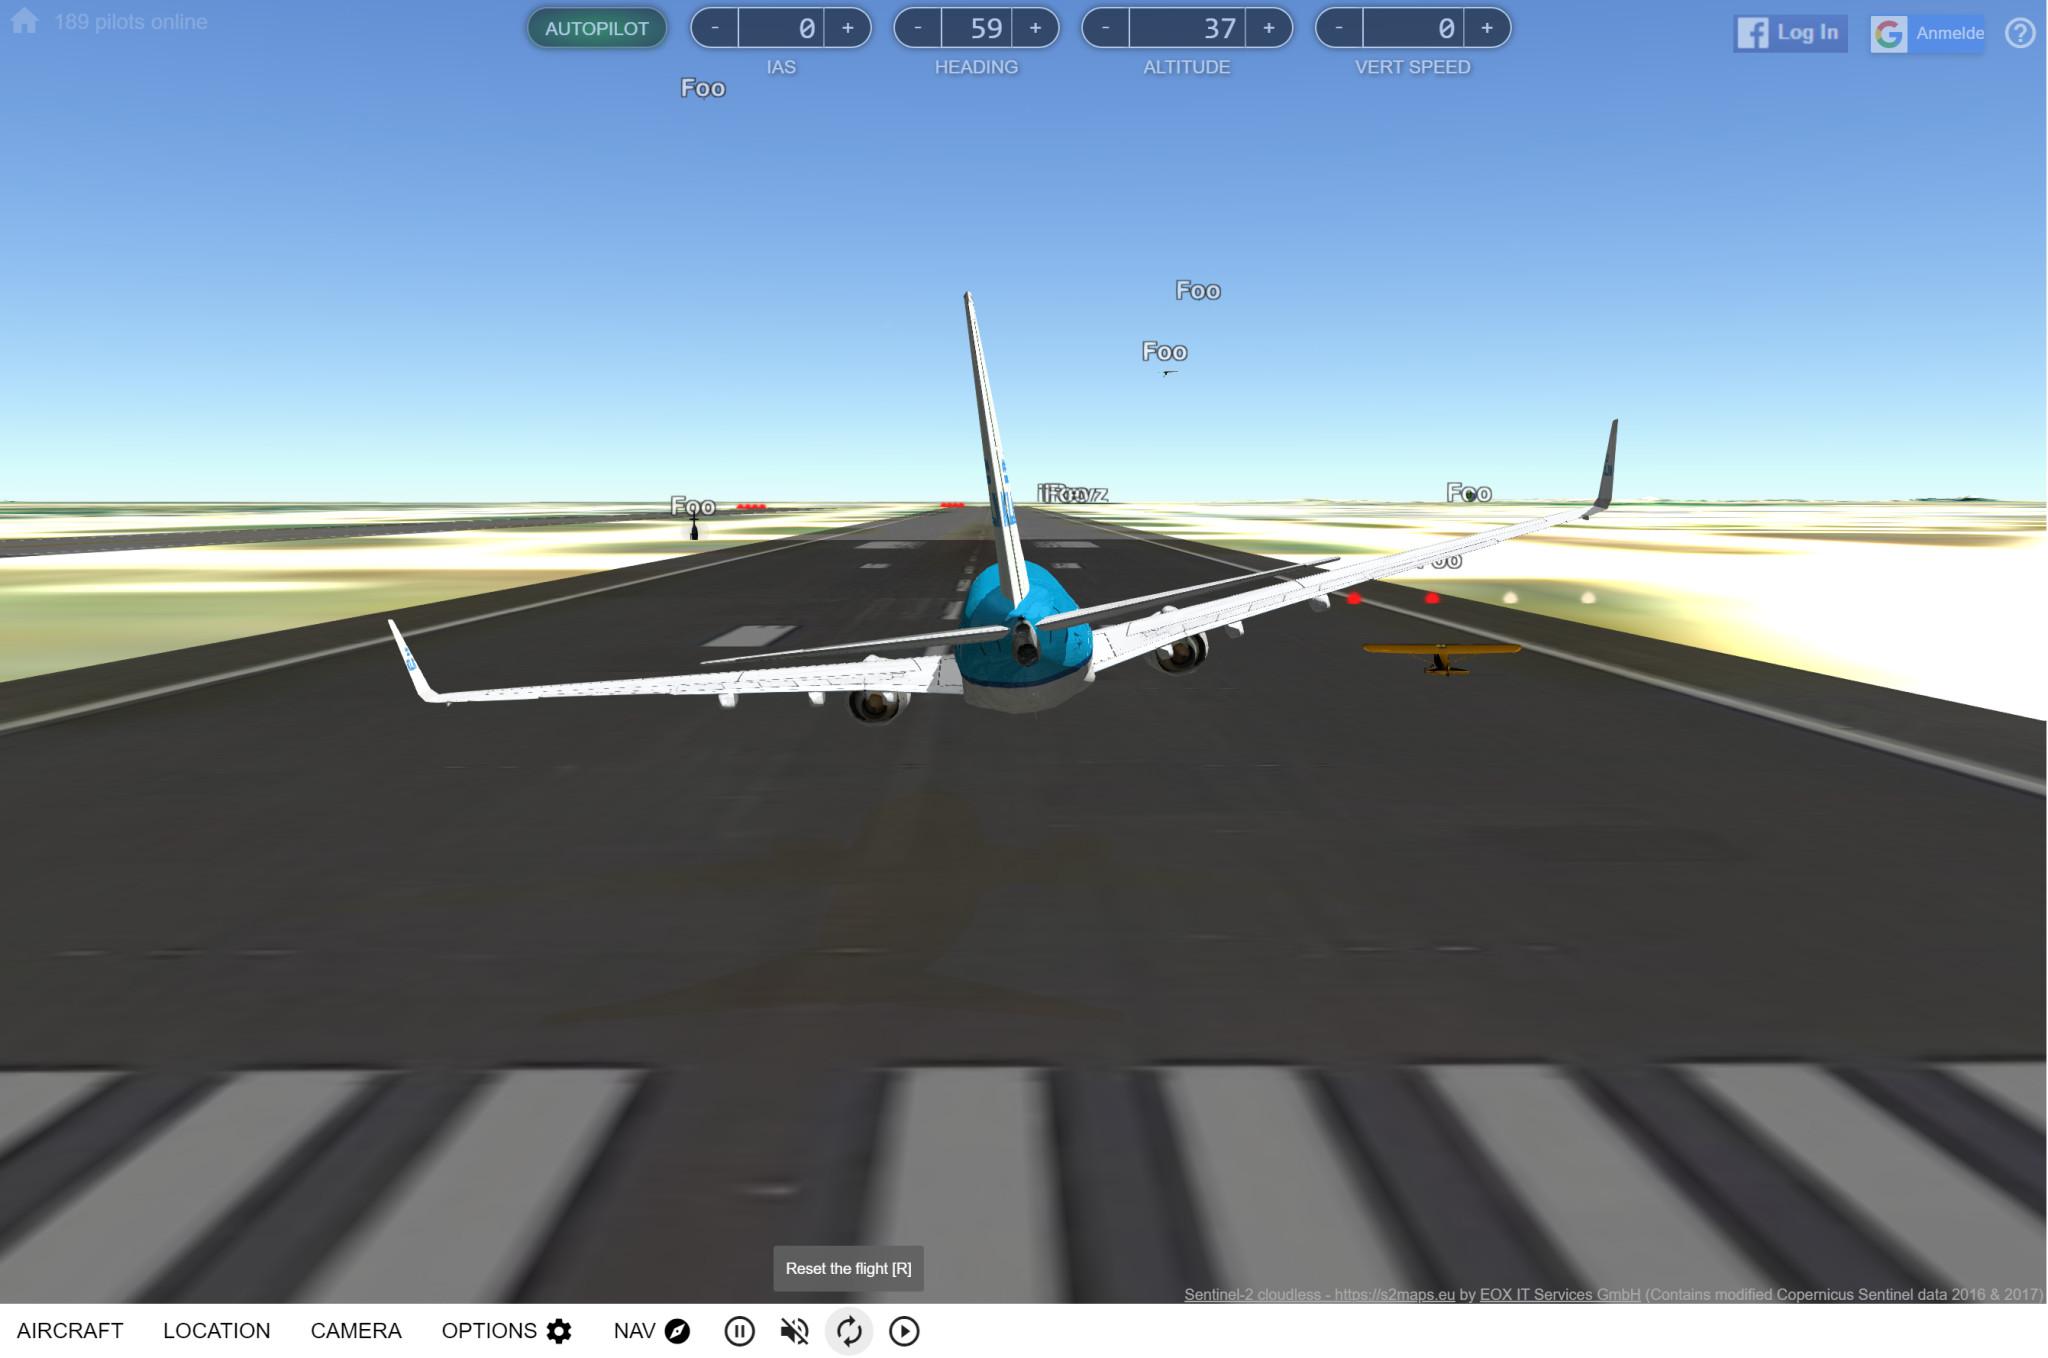 Screenshot 1 - GeoFS Online-Flugsimulator